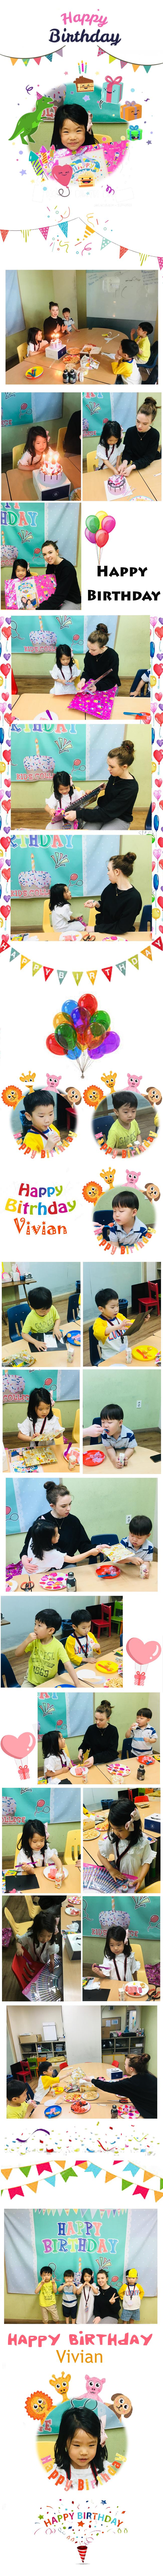 birthday form)_ Vivian.jpg